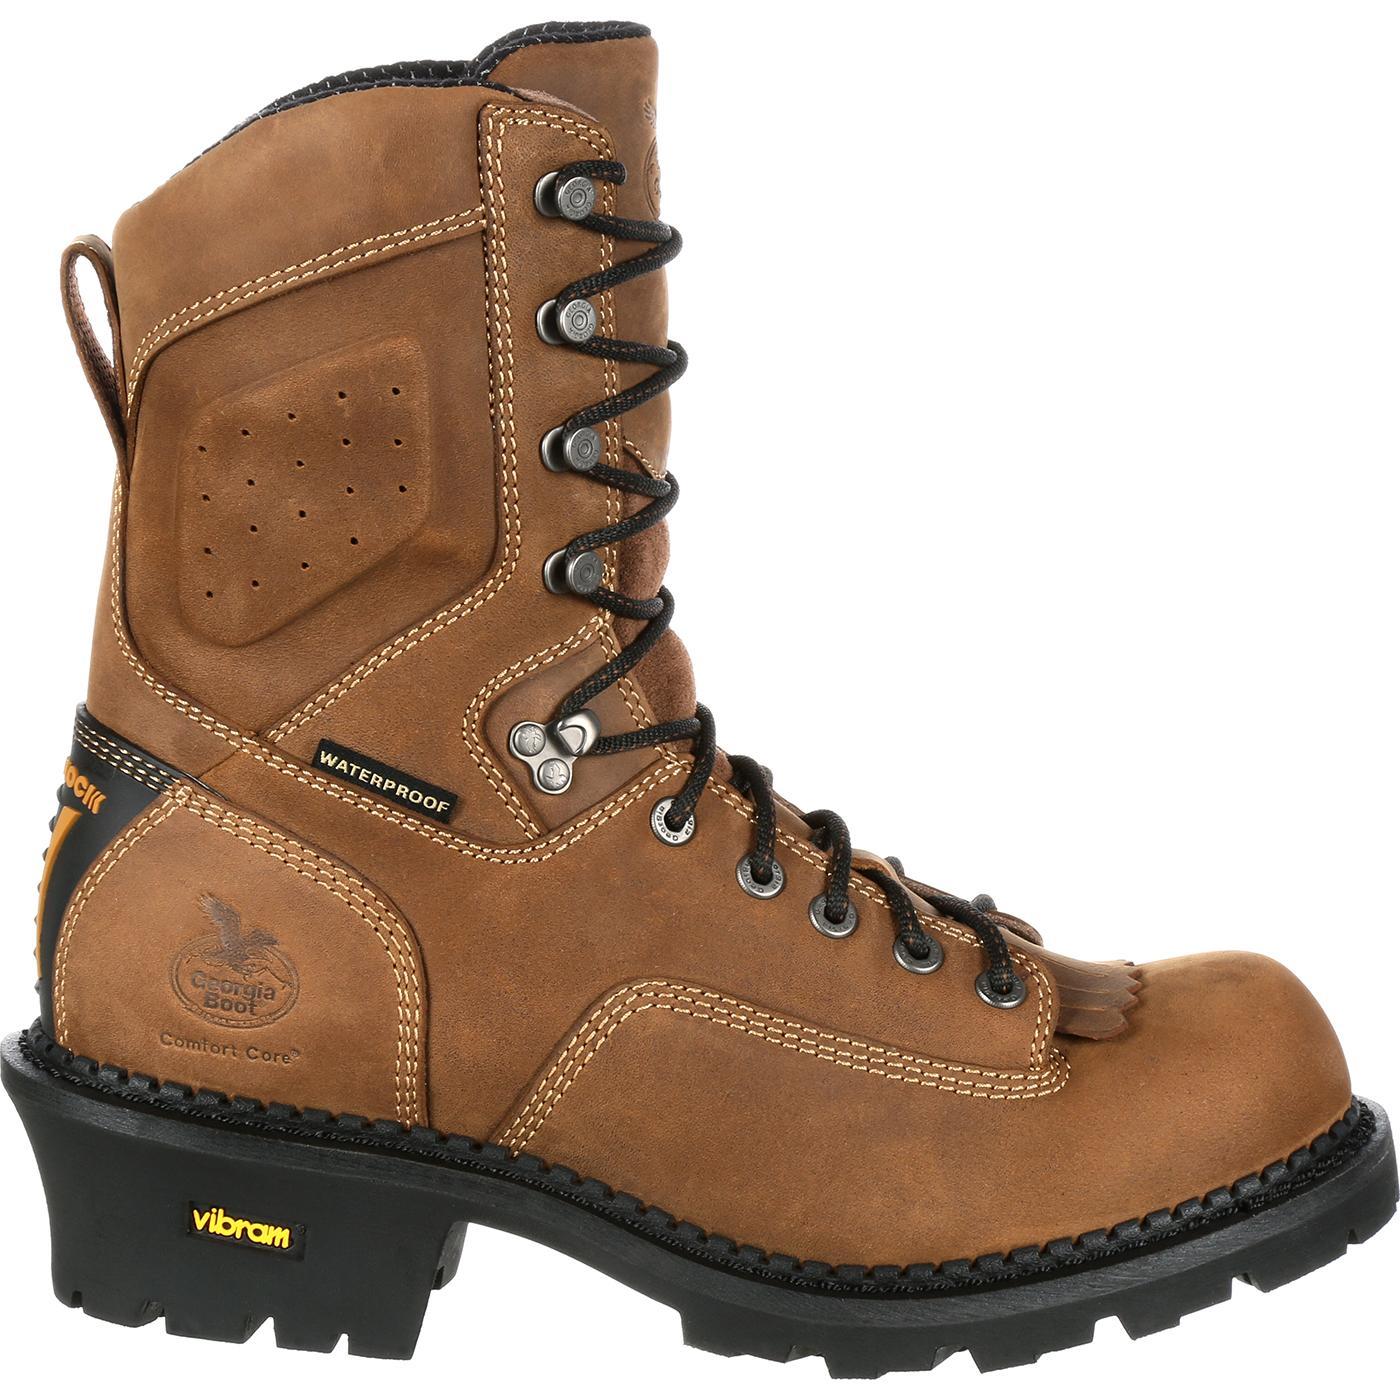 Georgia Boot: Comfort Core Logger Waterproof Work Boots